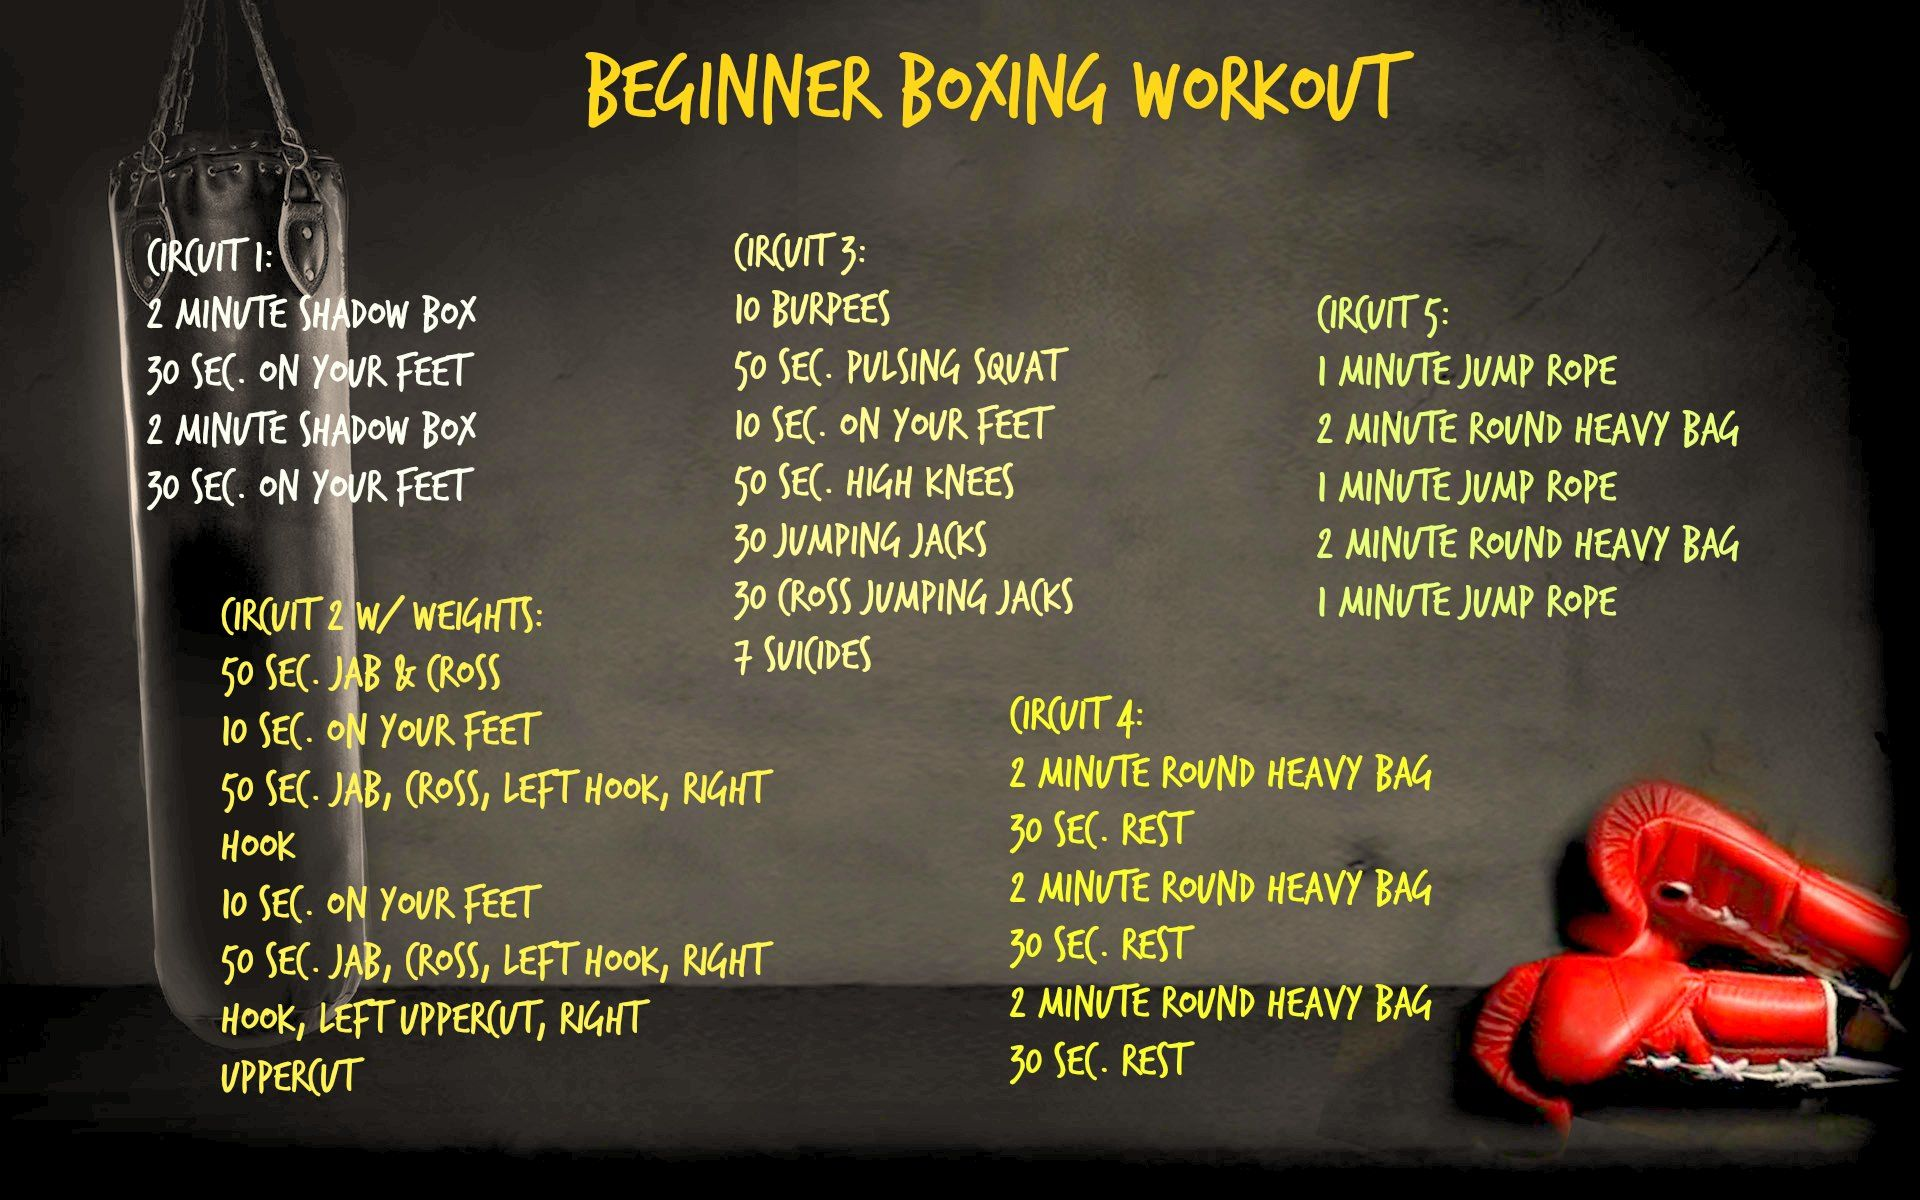 Www Quantummartialarts Com Au Buildabetteryou Martialarts Fitness Selfdefence Fun Boxing Workout Beginner Home Boxing Workout Boxing Workout Routine